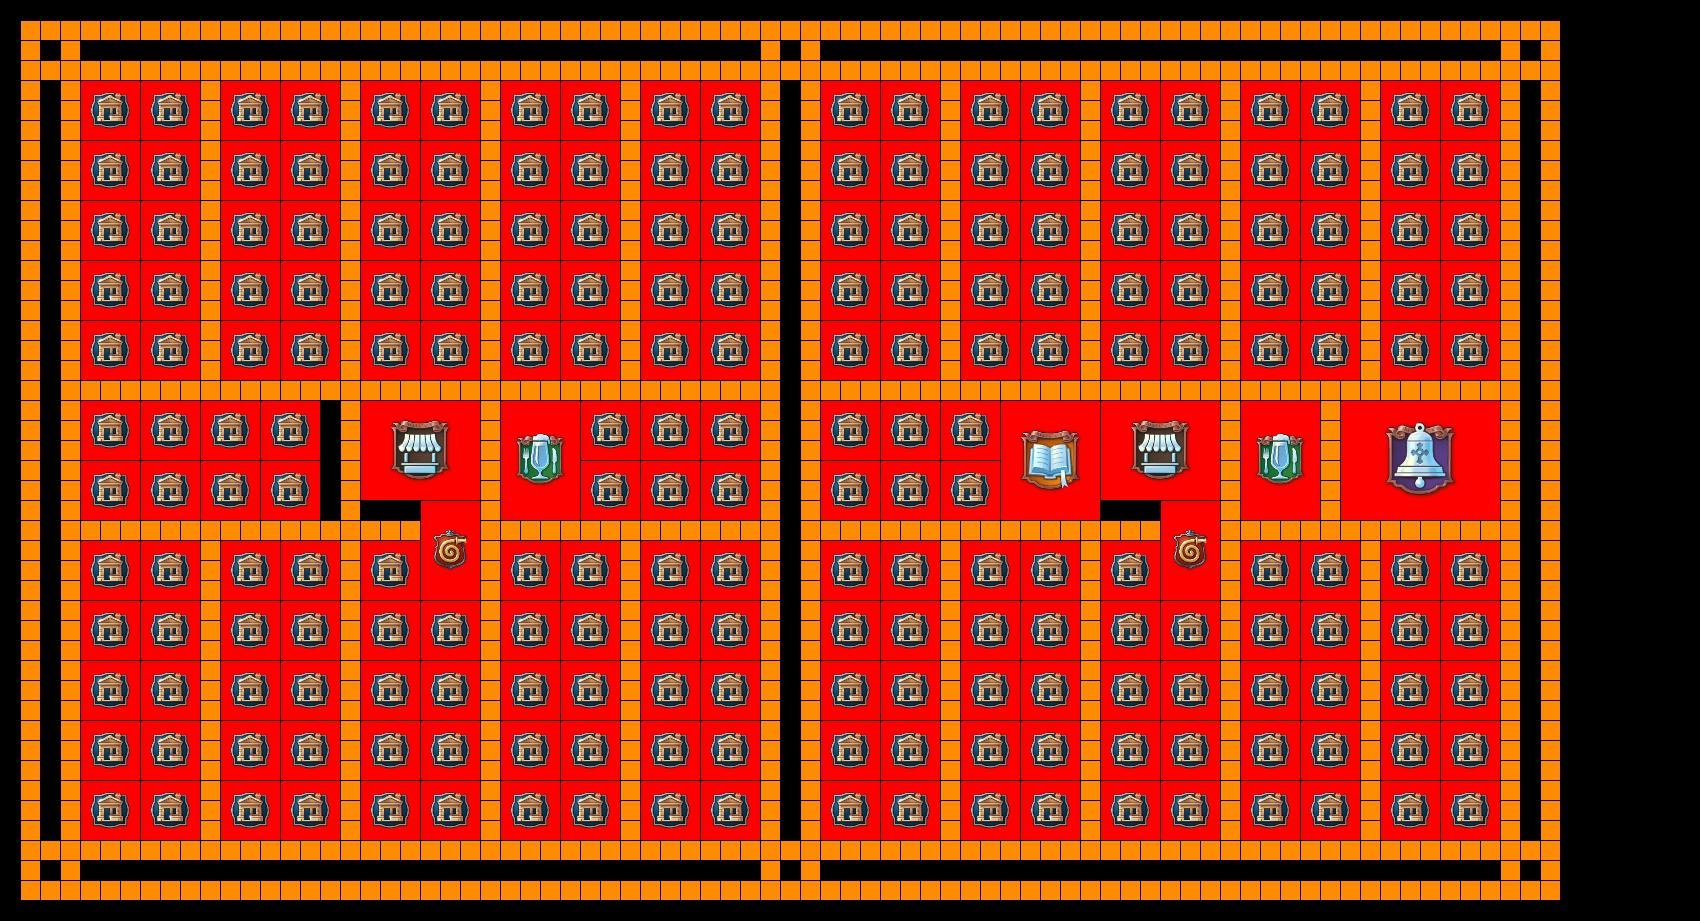 City layouts | Anno 1800 Wiki | FANDOM powered by Wikia